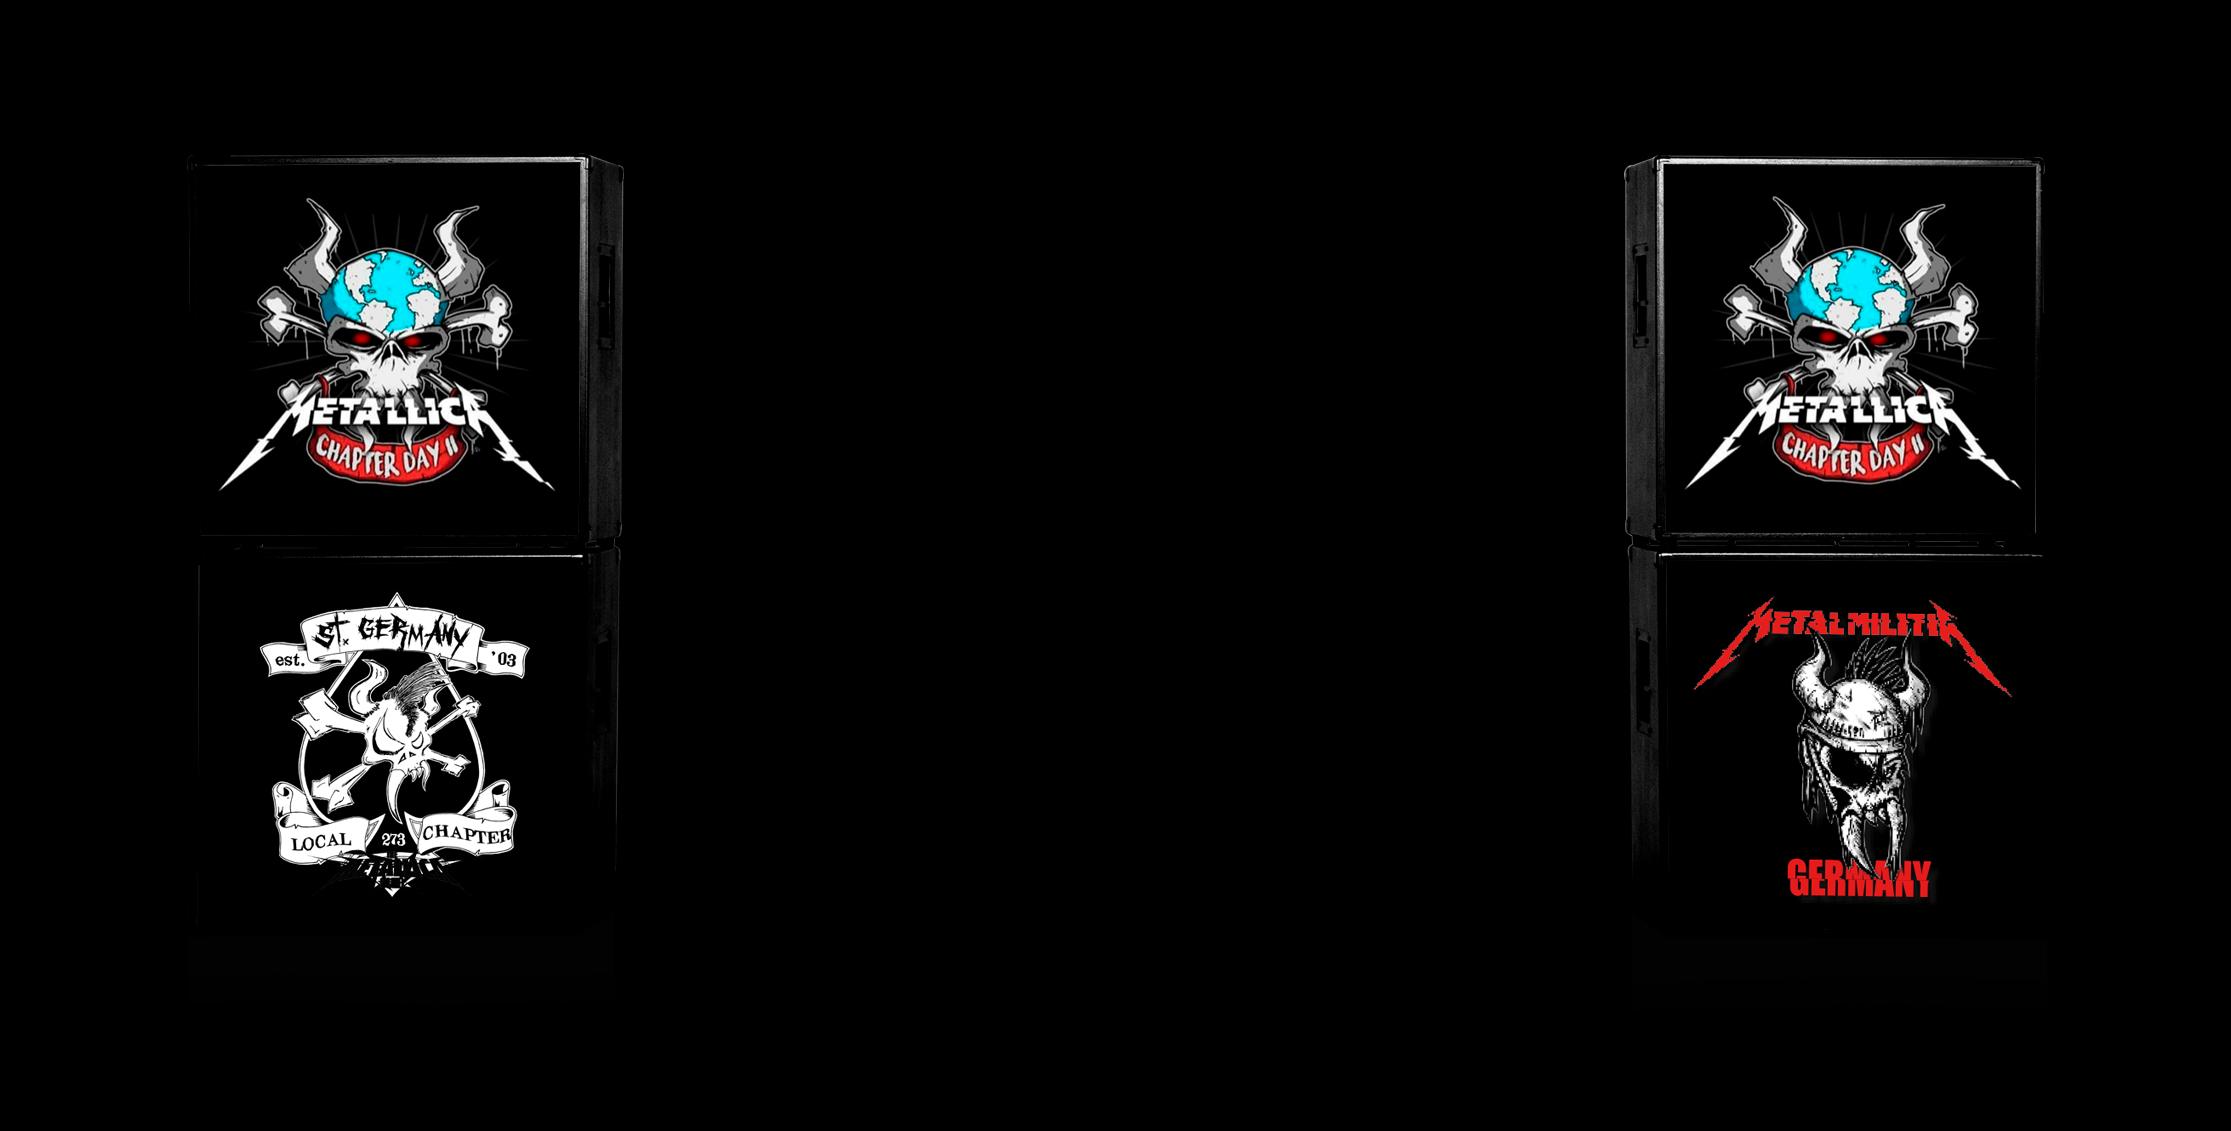 mytallica-tribute-band-2021-livestream-background-dark